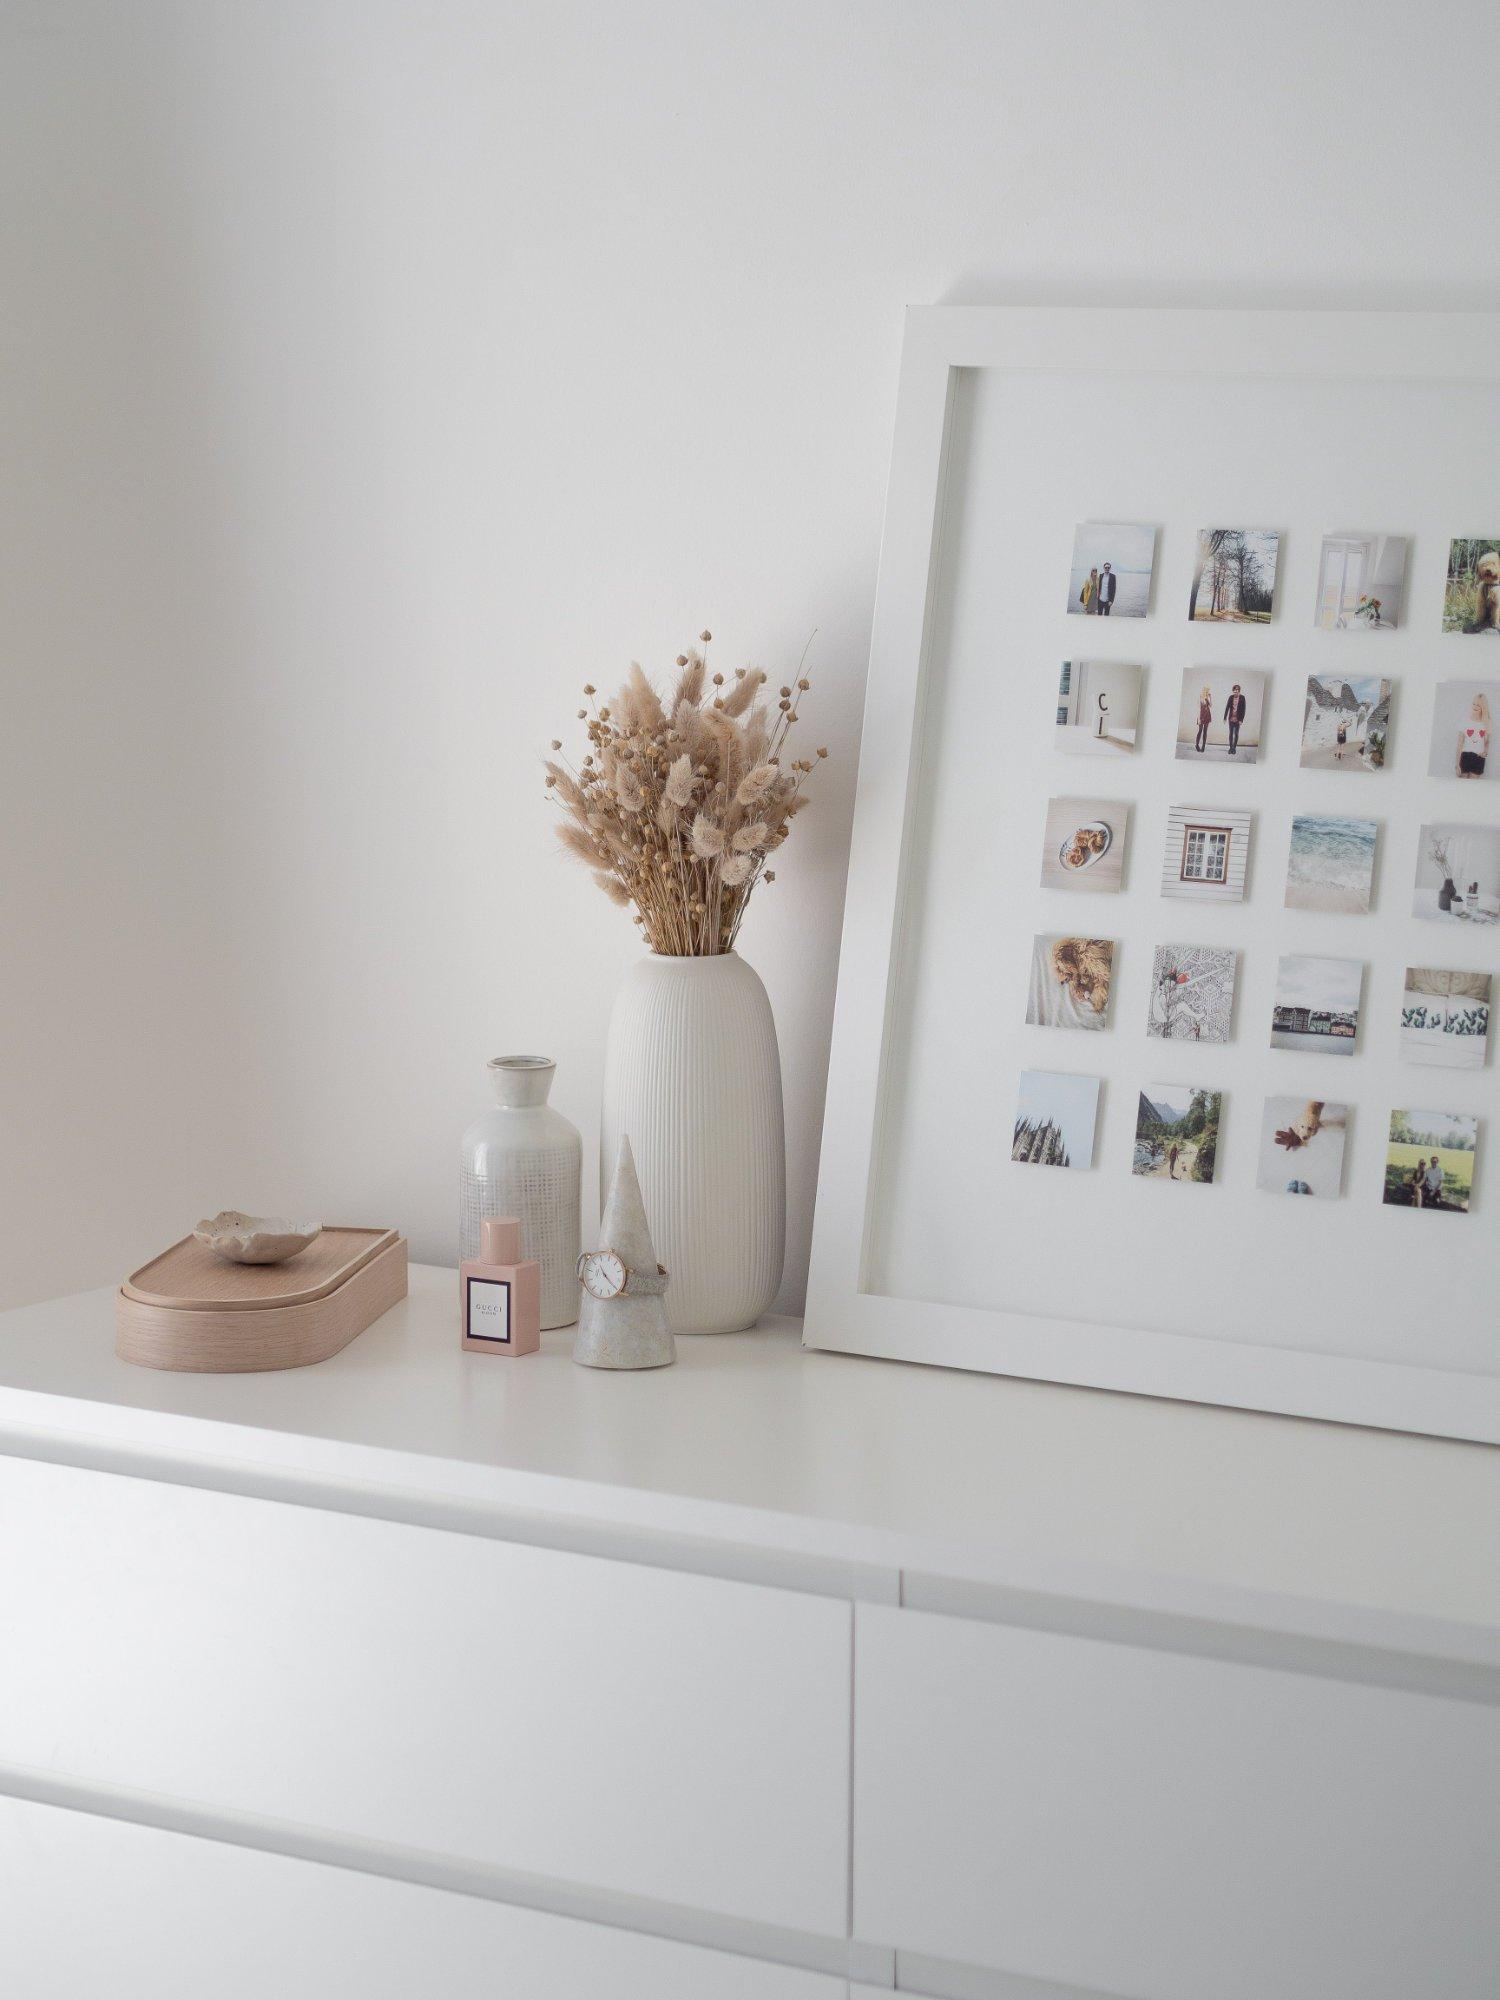 That Scandinavian Feeling Home Tour bedroom dresser details